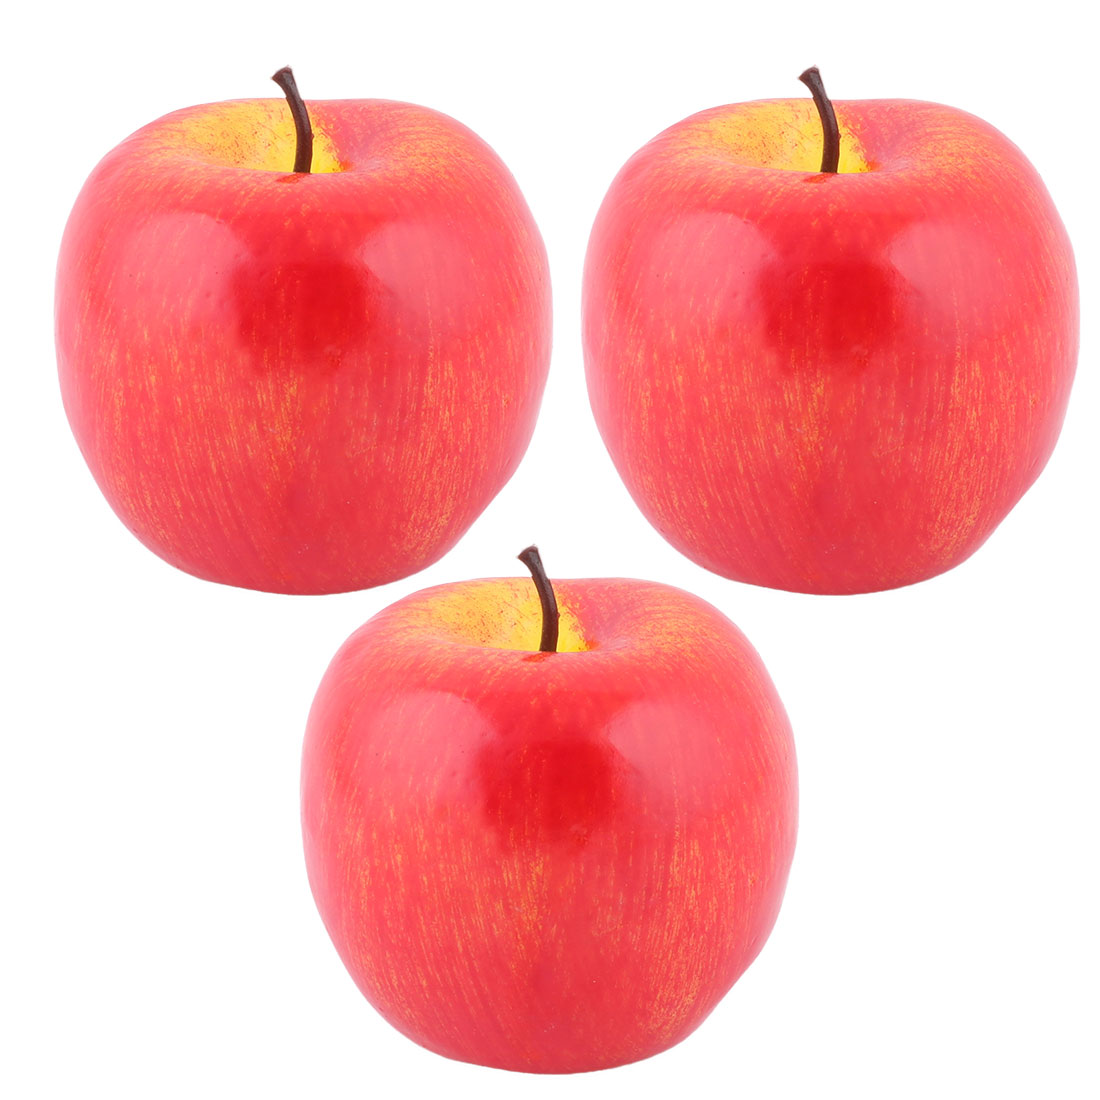 House Table Decor Foam Artificial Apple Designed Emulation Fruit Mold Red 3pcs